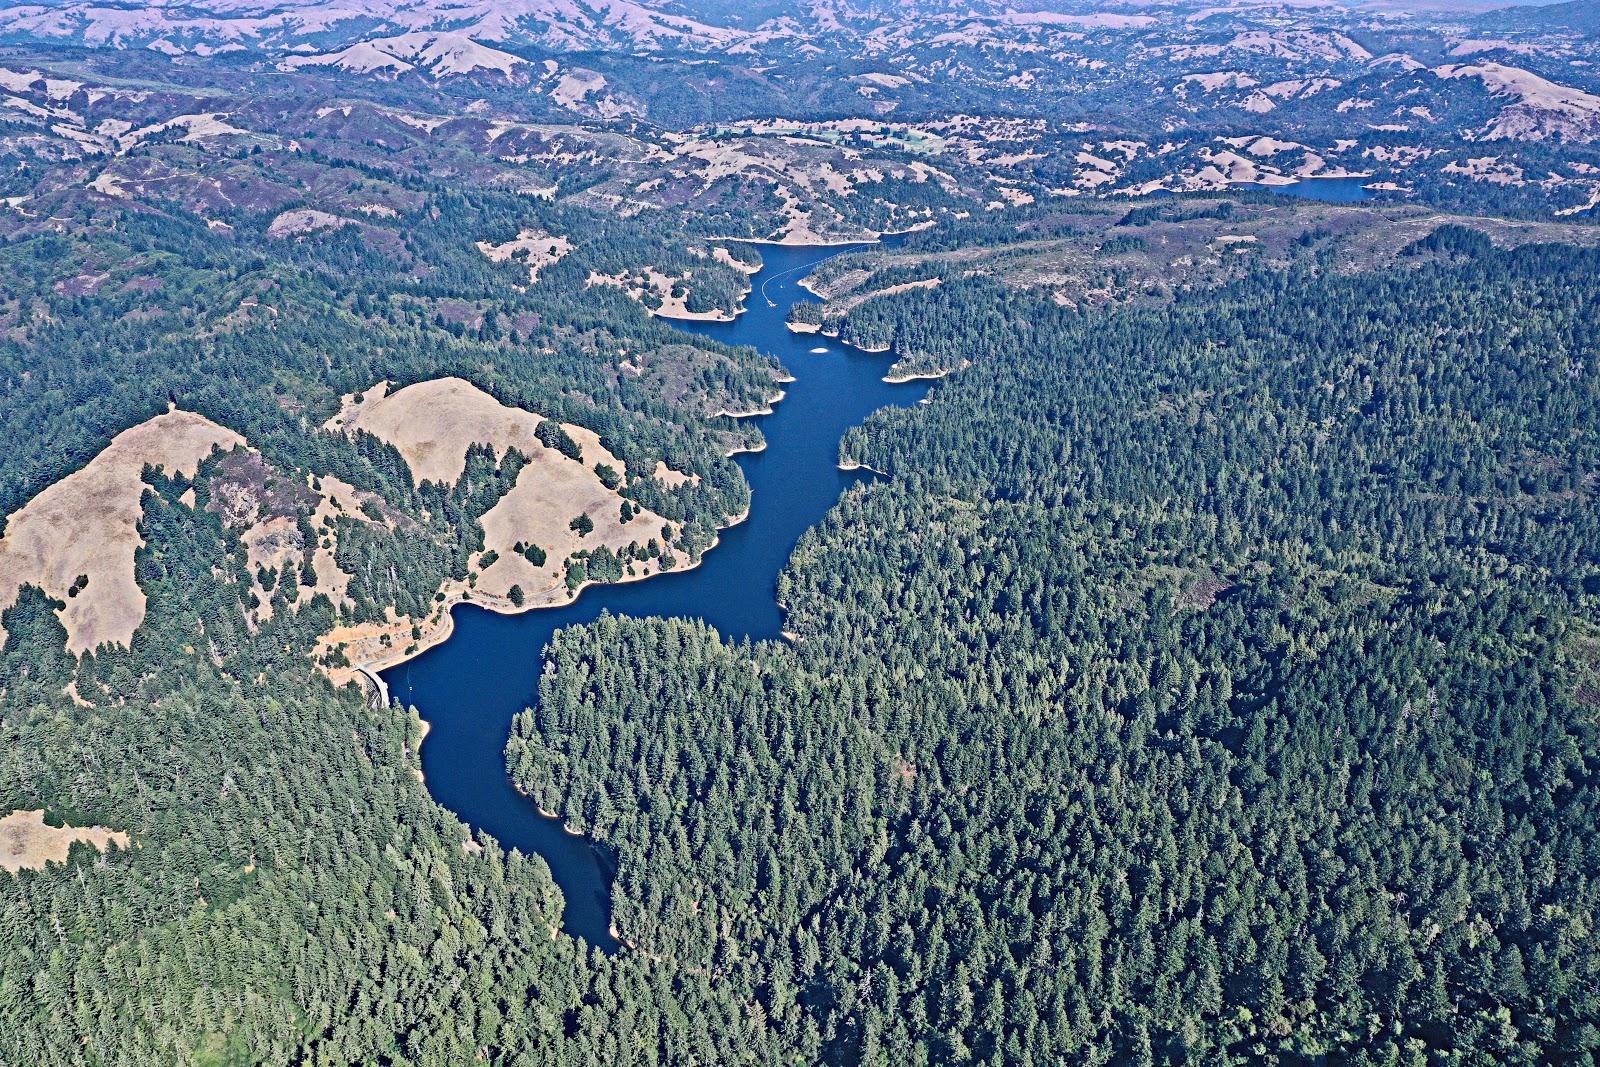 Bike ride Mt. Tamalpais from Alpine Dam - aerial drone photo of ridgeline and Alpine Lake